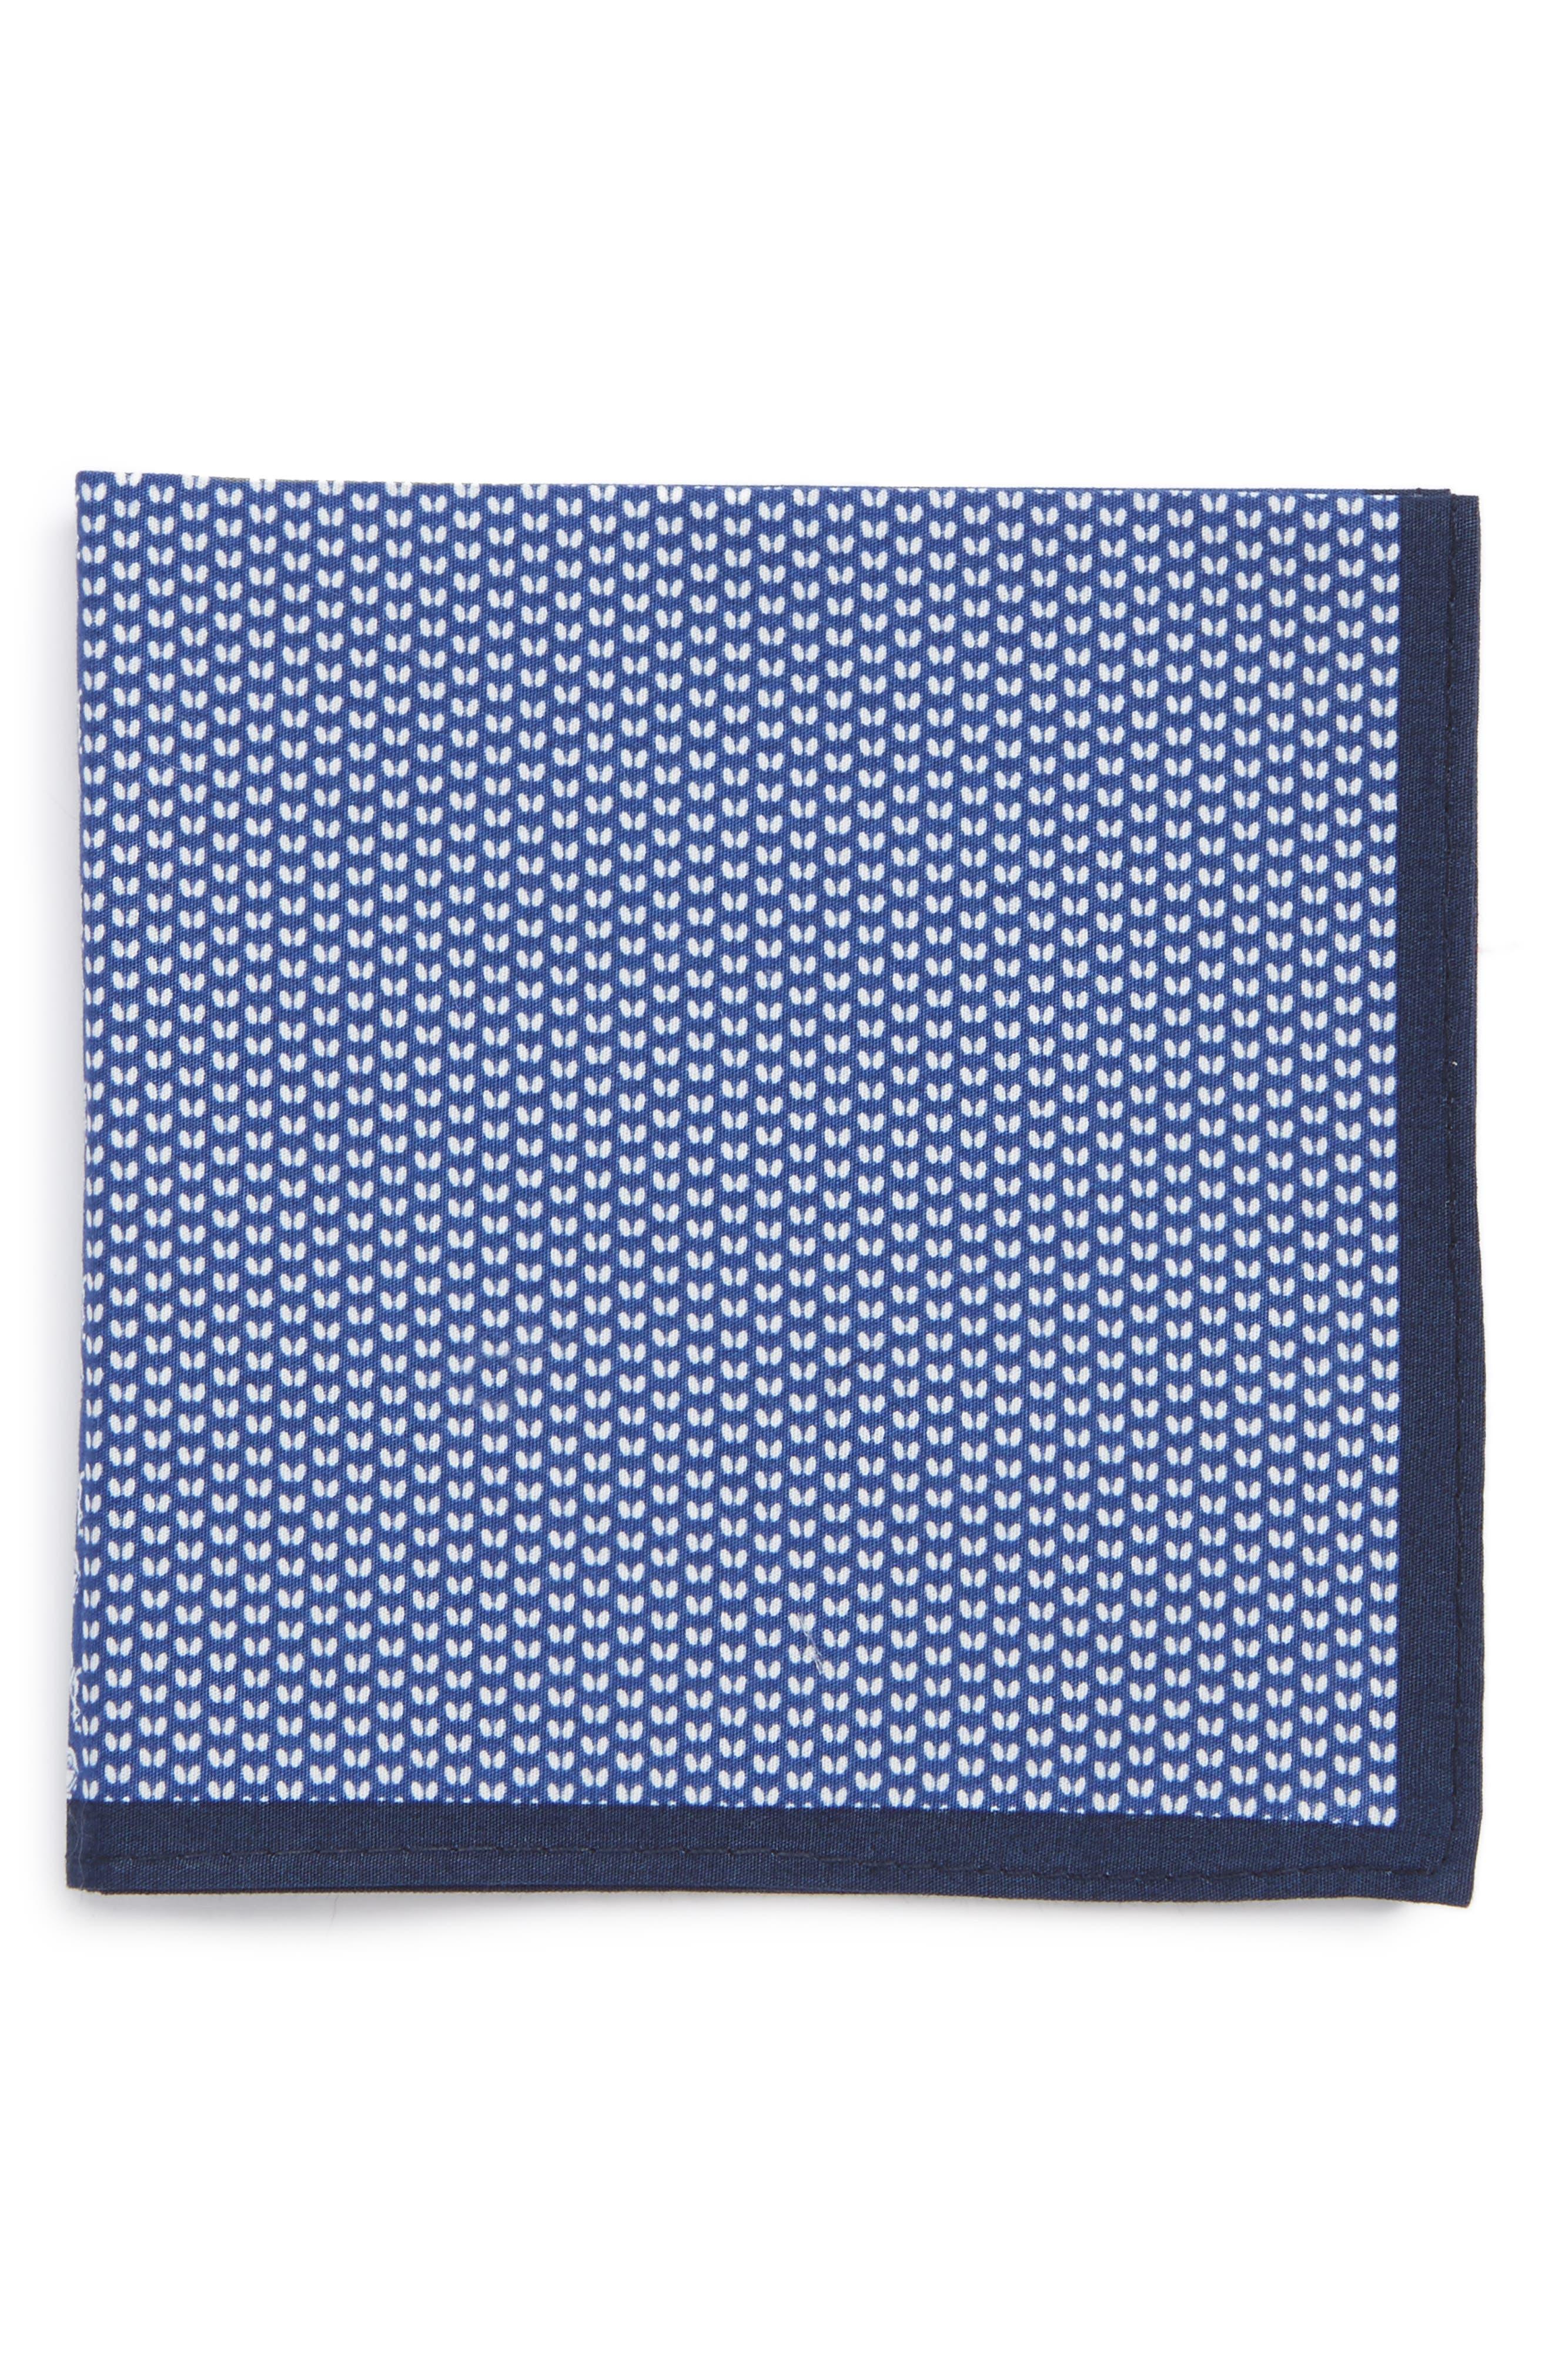 NORDSTROM Mixed Print Pocket Square